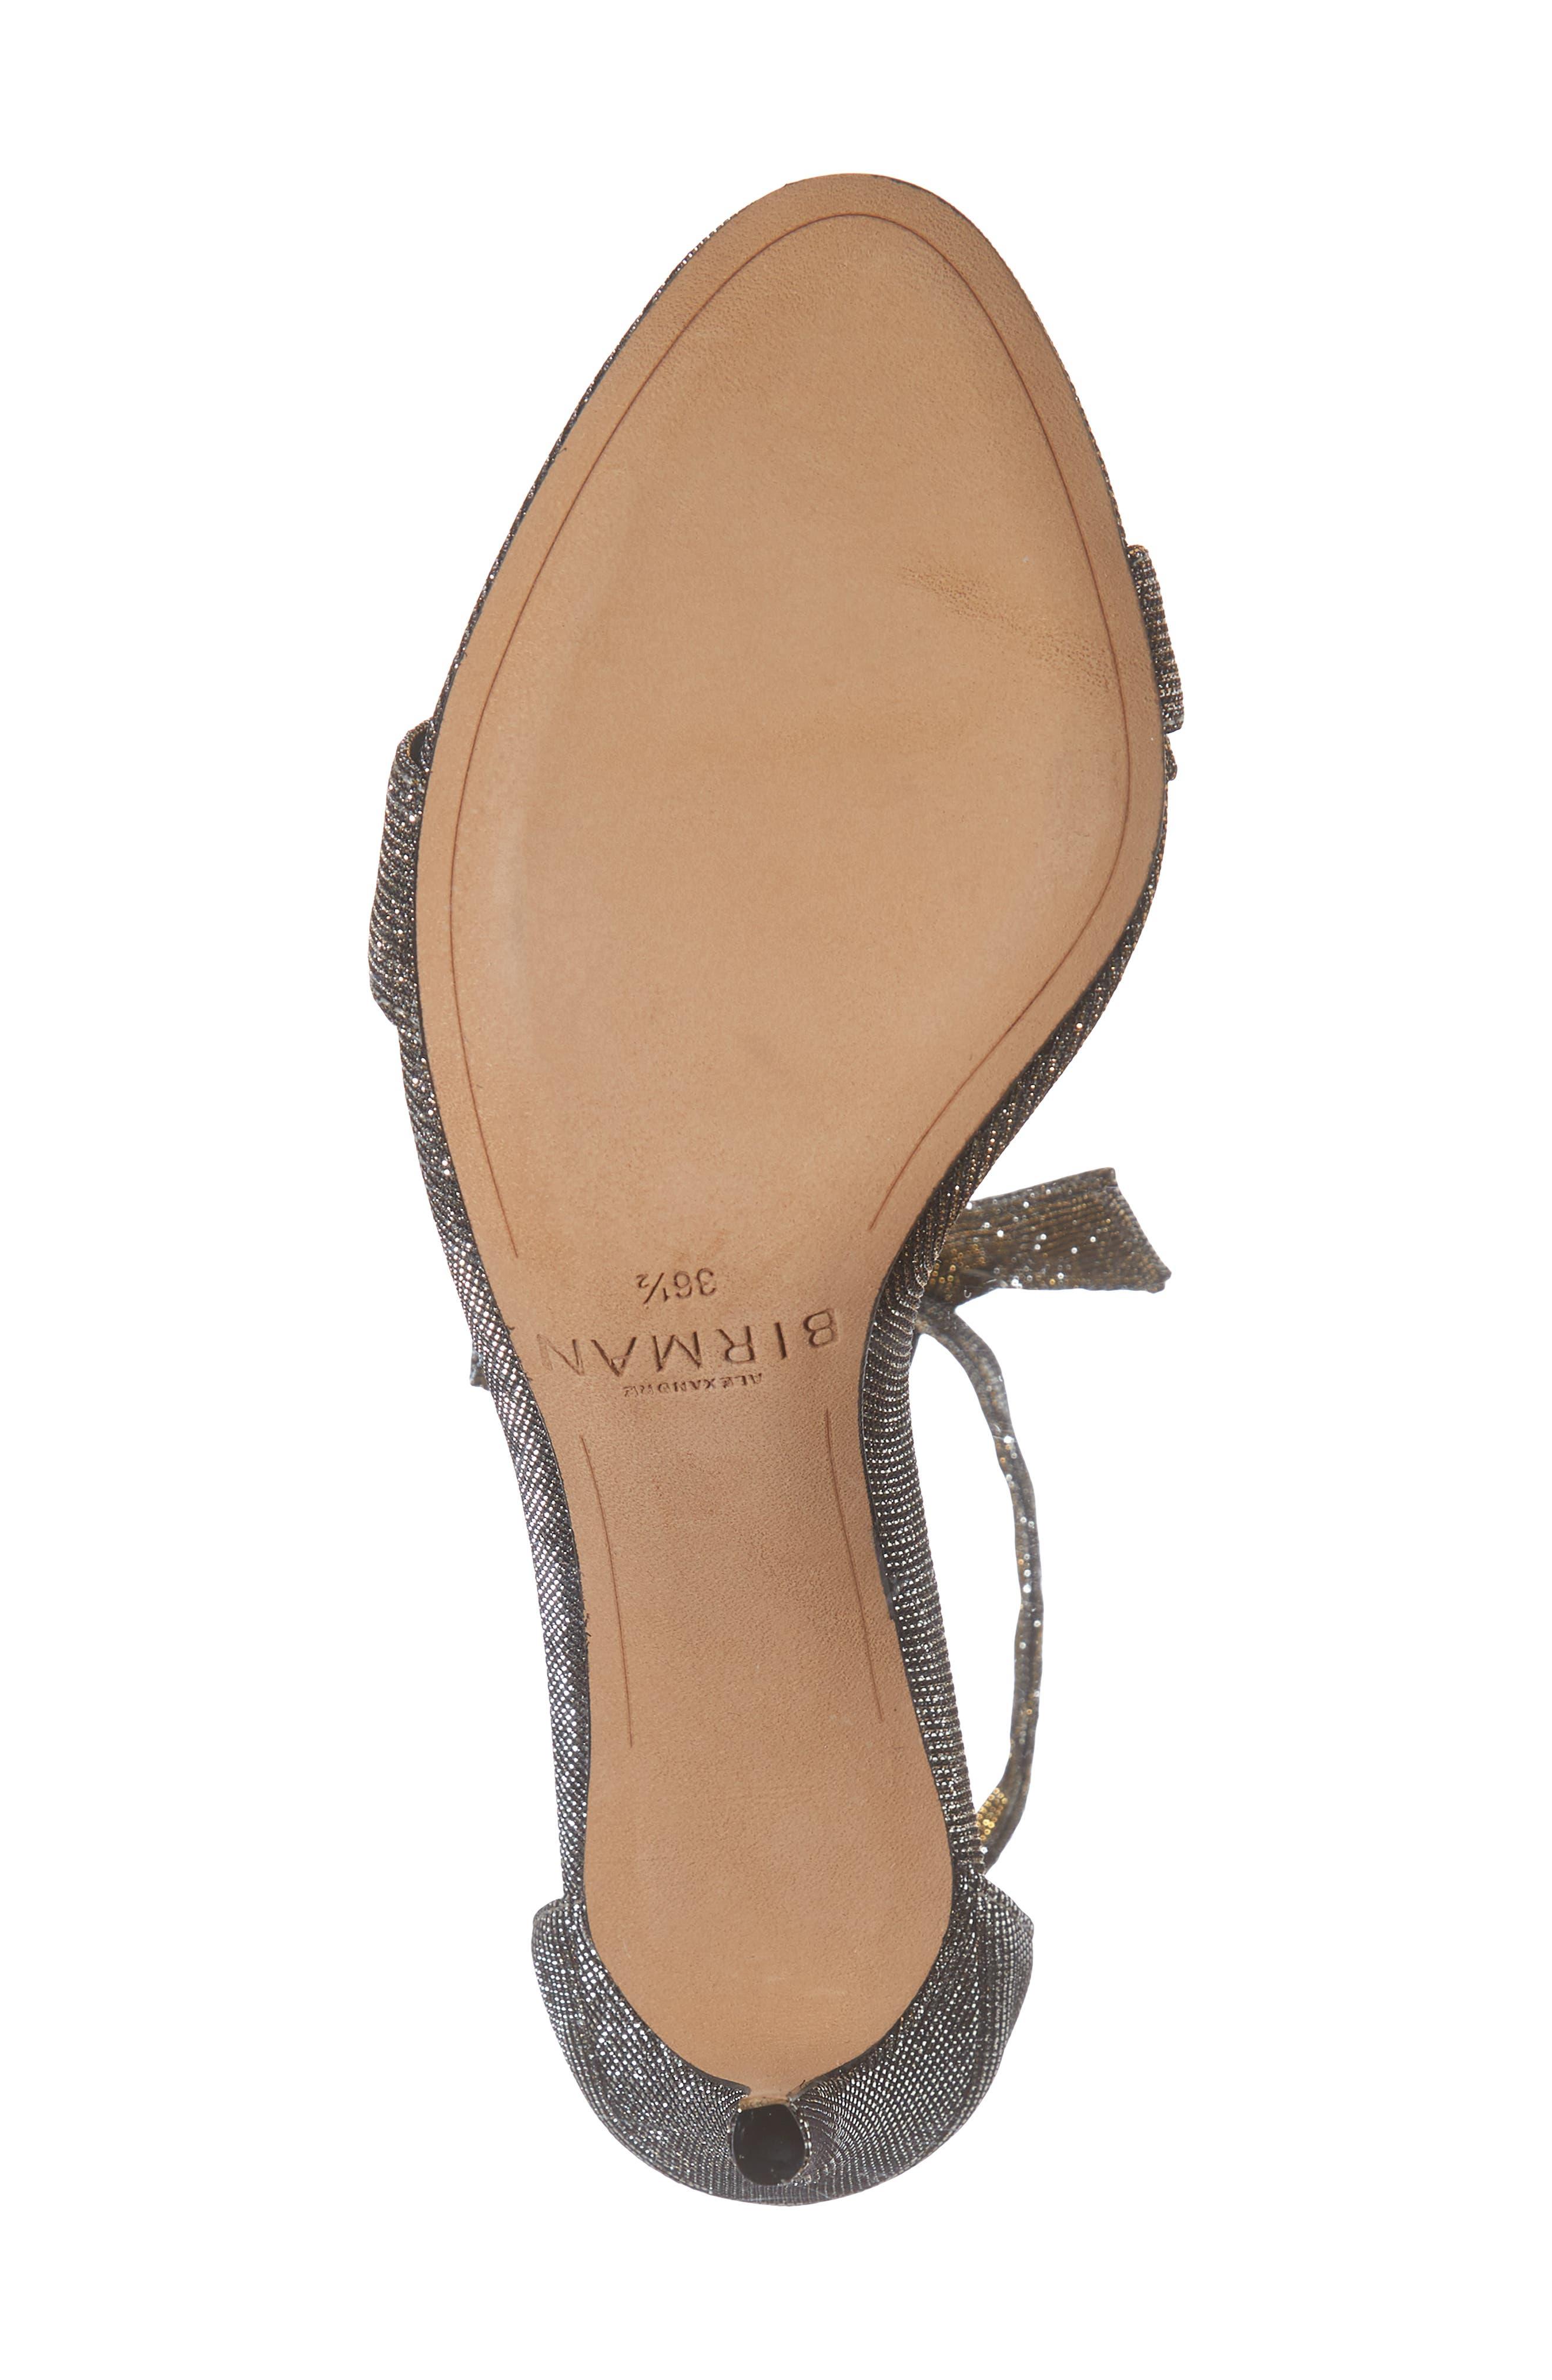 Clarita Ankle Strap Sandal,                             Alternate thumbnail 6, color,                             SILVER